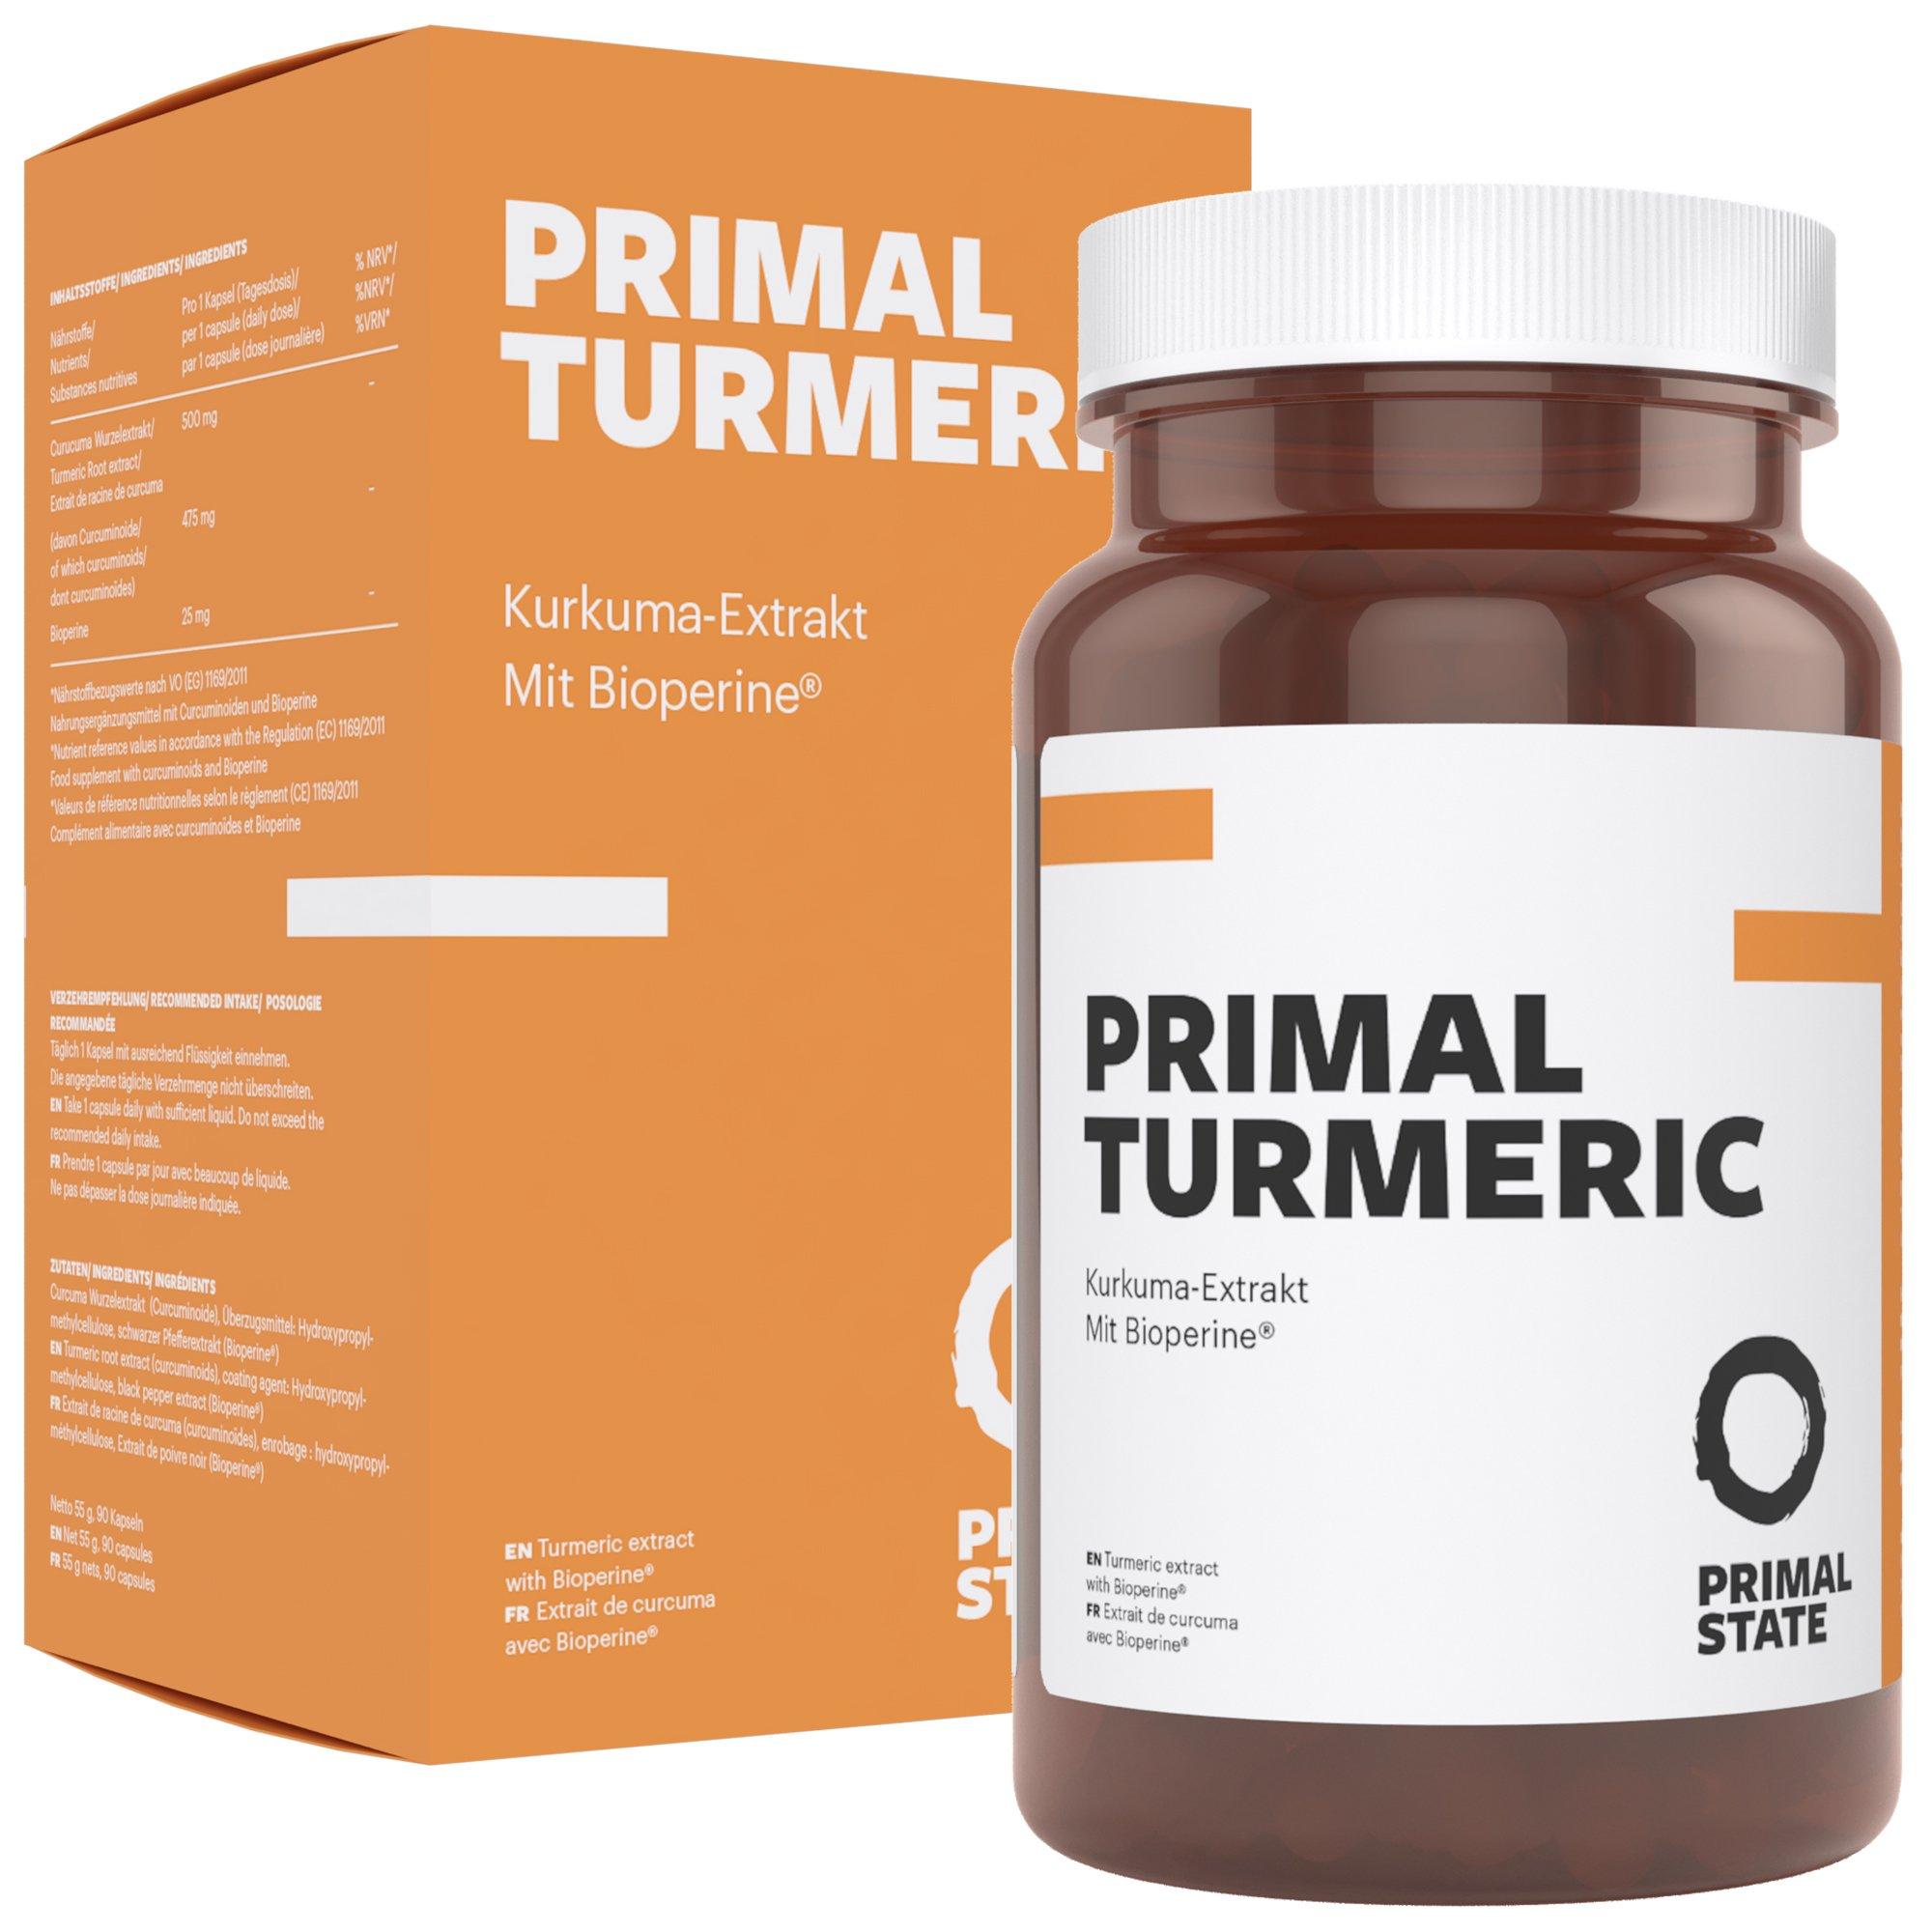 Kurkuma Kapseln Hochdosiert | PRIMAL TURMERIC | Hochdosiertes Curcuma + Bioperin (Schwarzer Pfeffer Extrakt) | Premium Kurkumin ohne Zusatzstoffe | Laborgeprüft | 3 Monatspackung – 90 vegane Kapseln